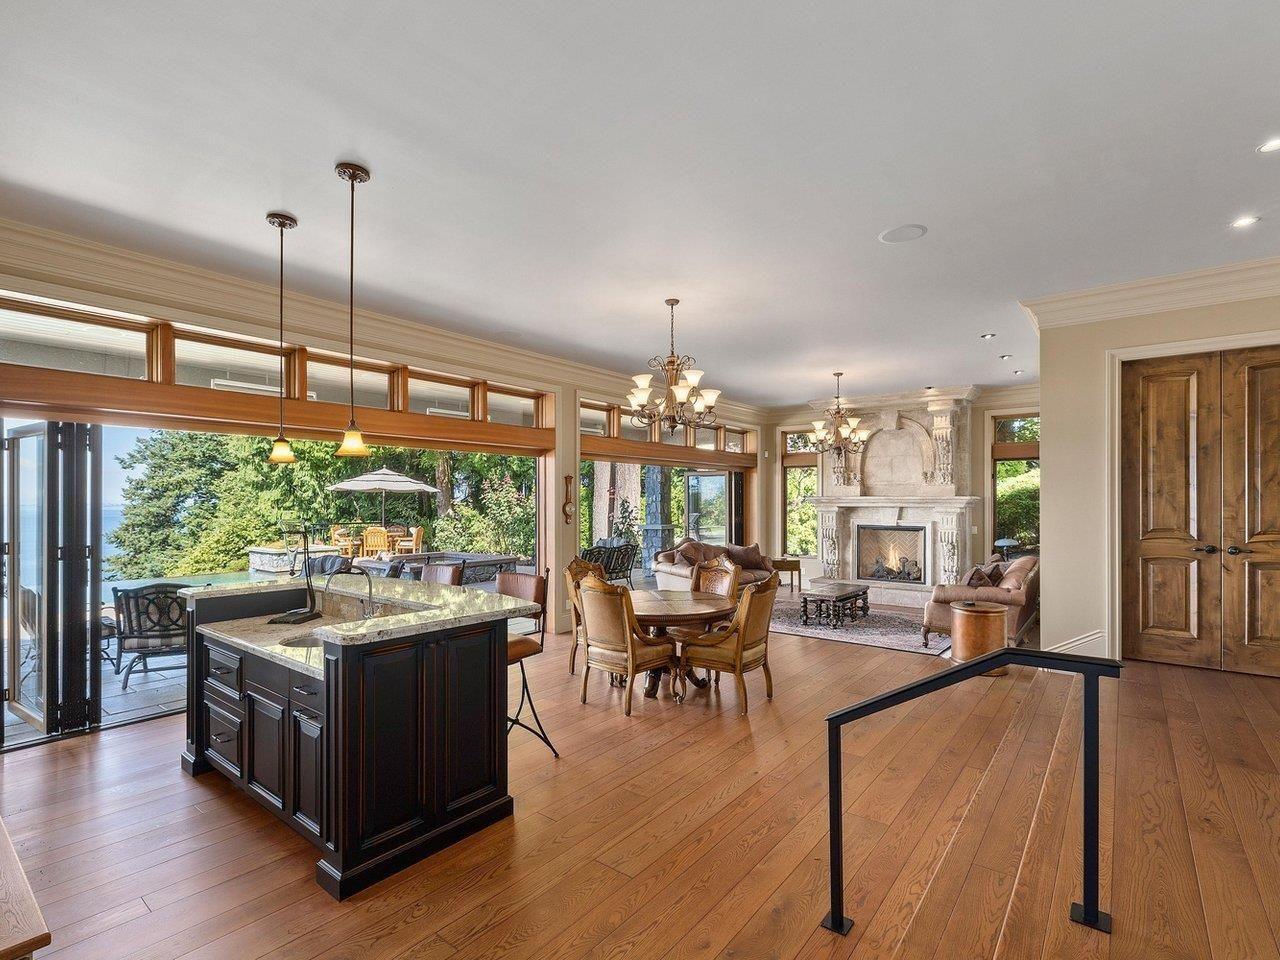 Main Photo: 12626 15 Avenue in Surrey: Crescent Bch Ocean Pk. House for sale (South Surrey White Rock)  : MLS®# R2609386